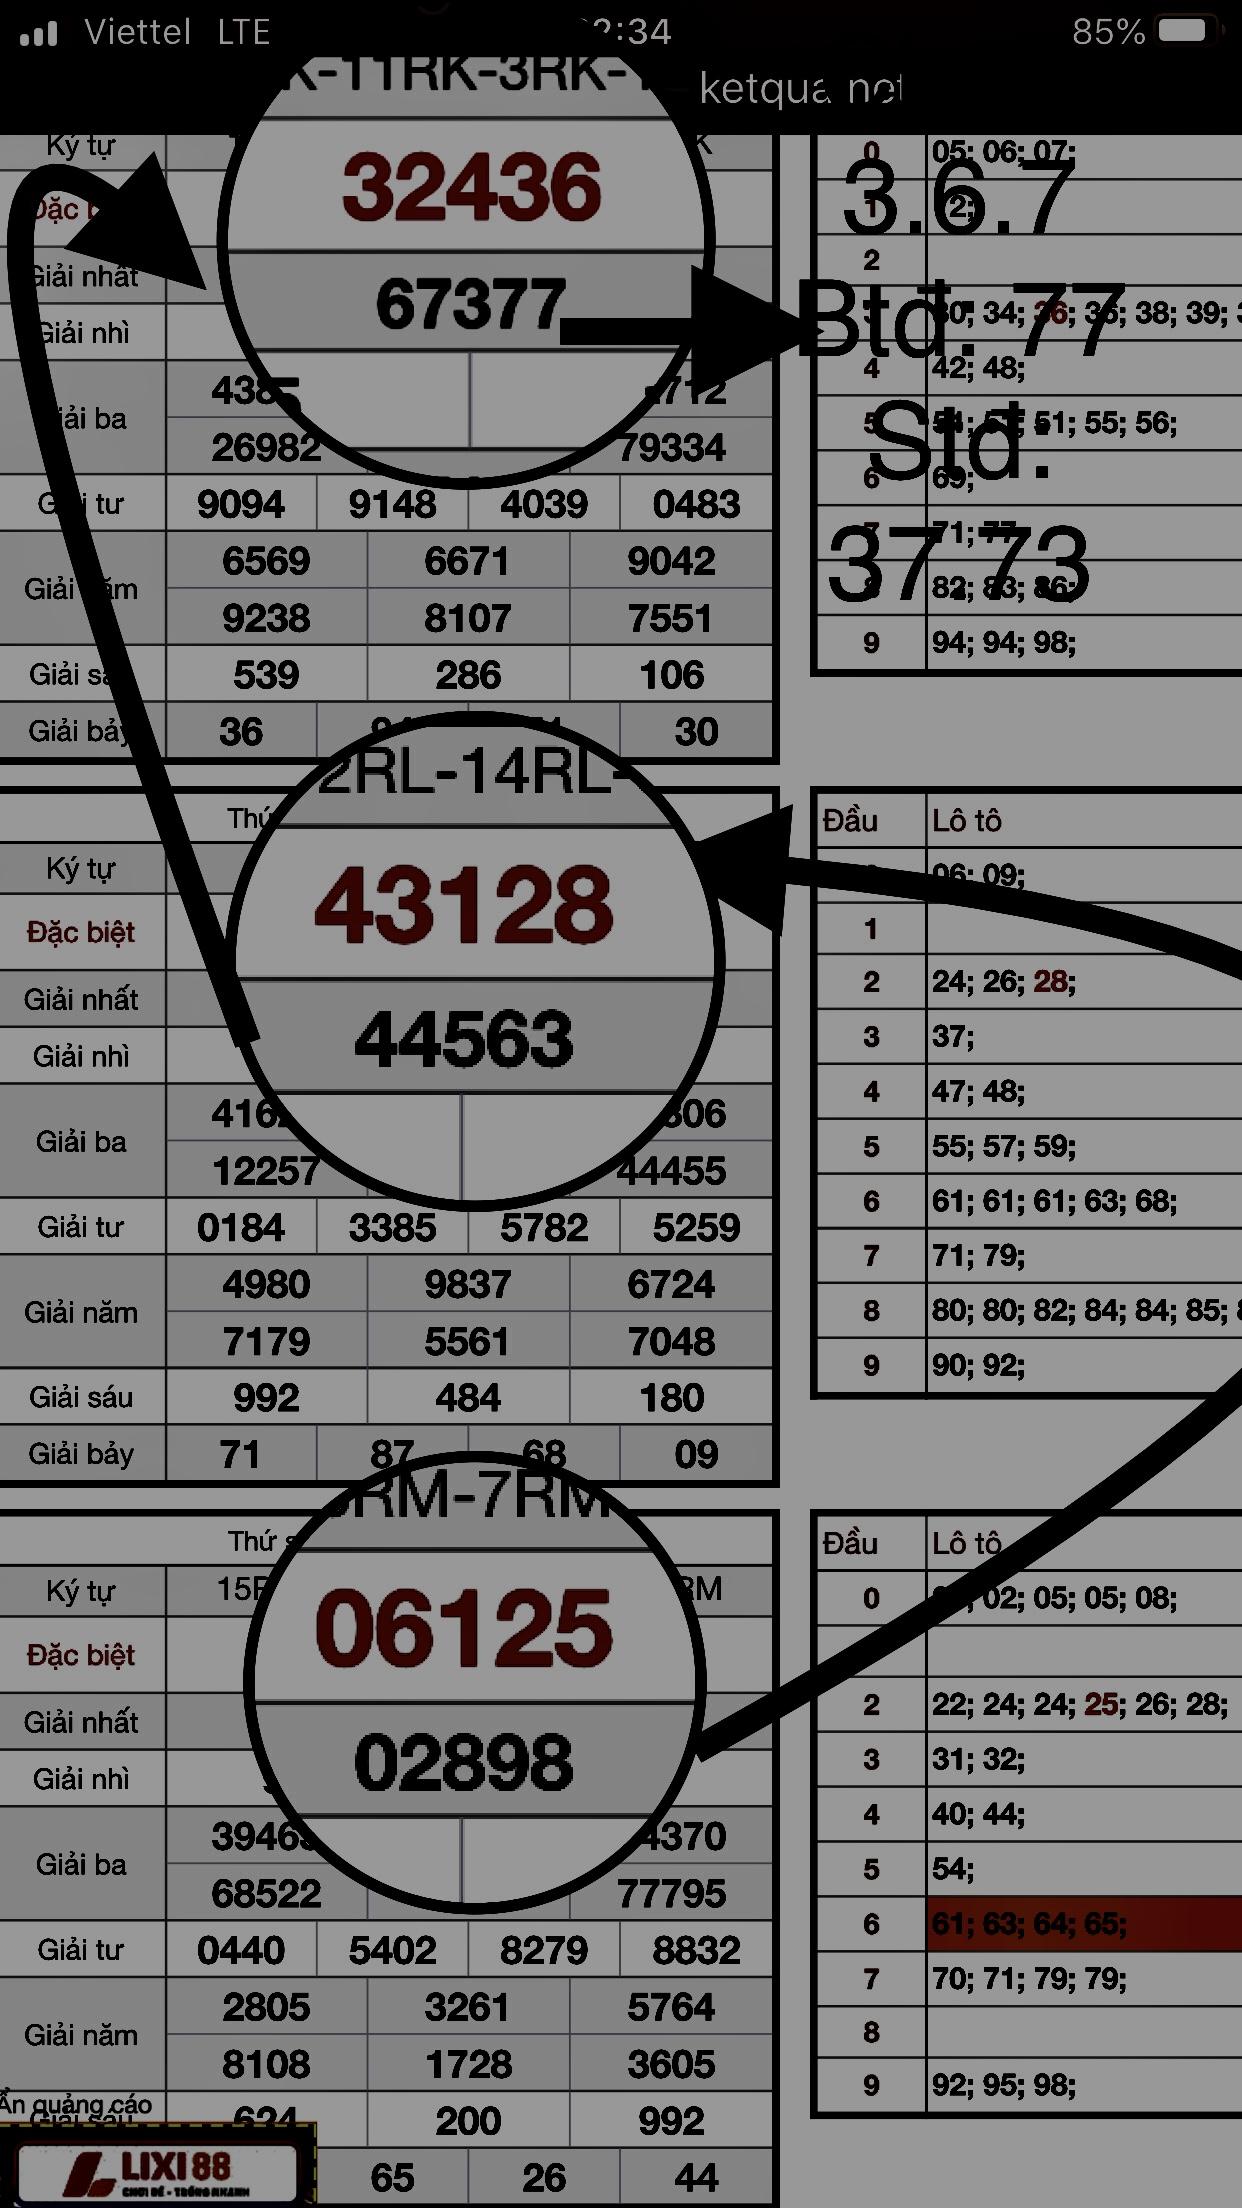 1BB5BDE5-3B32-4EC4-BB45-991942C3109B.jpeg